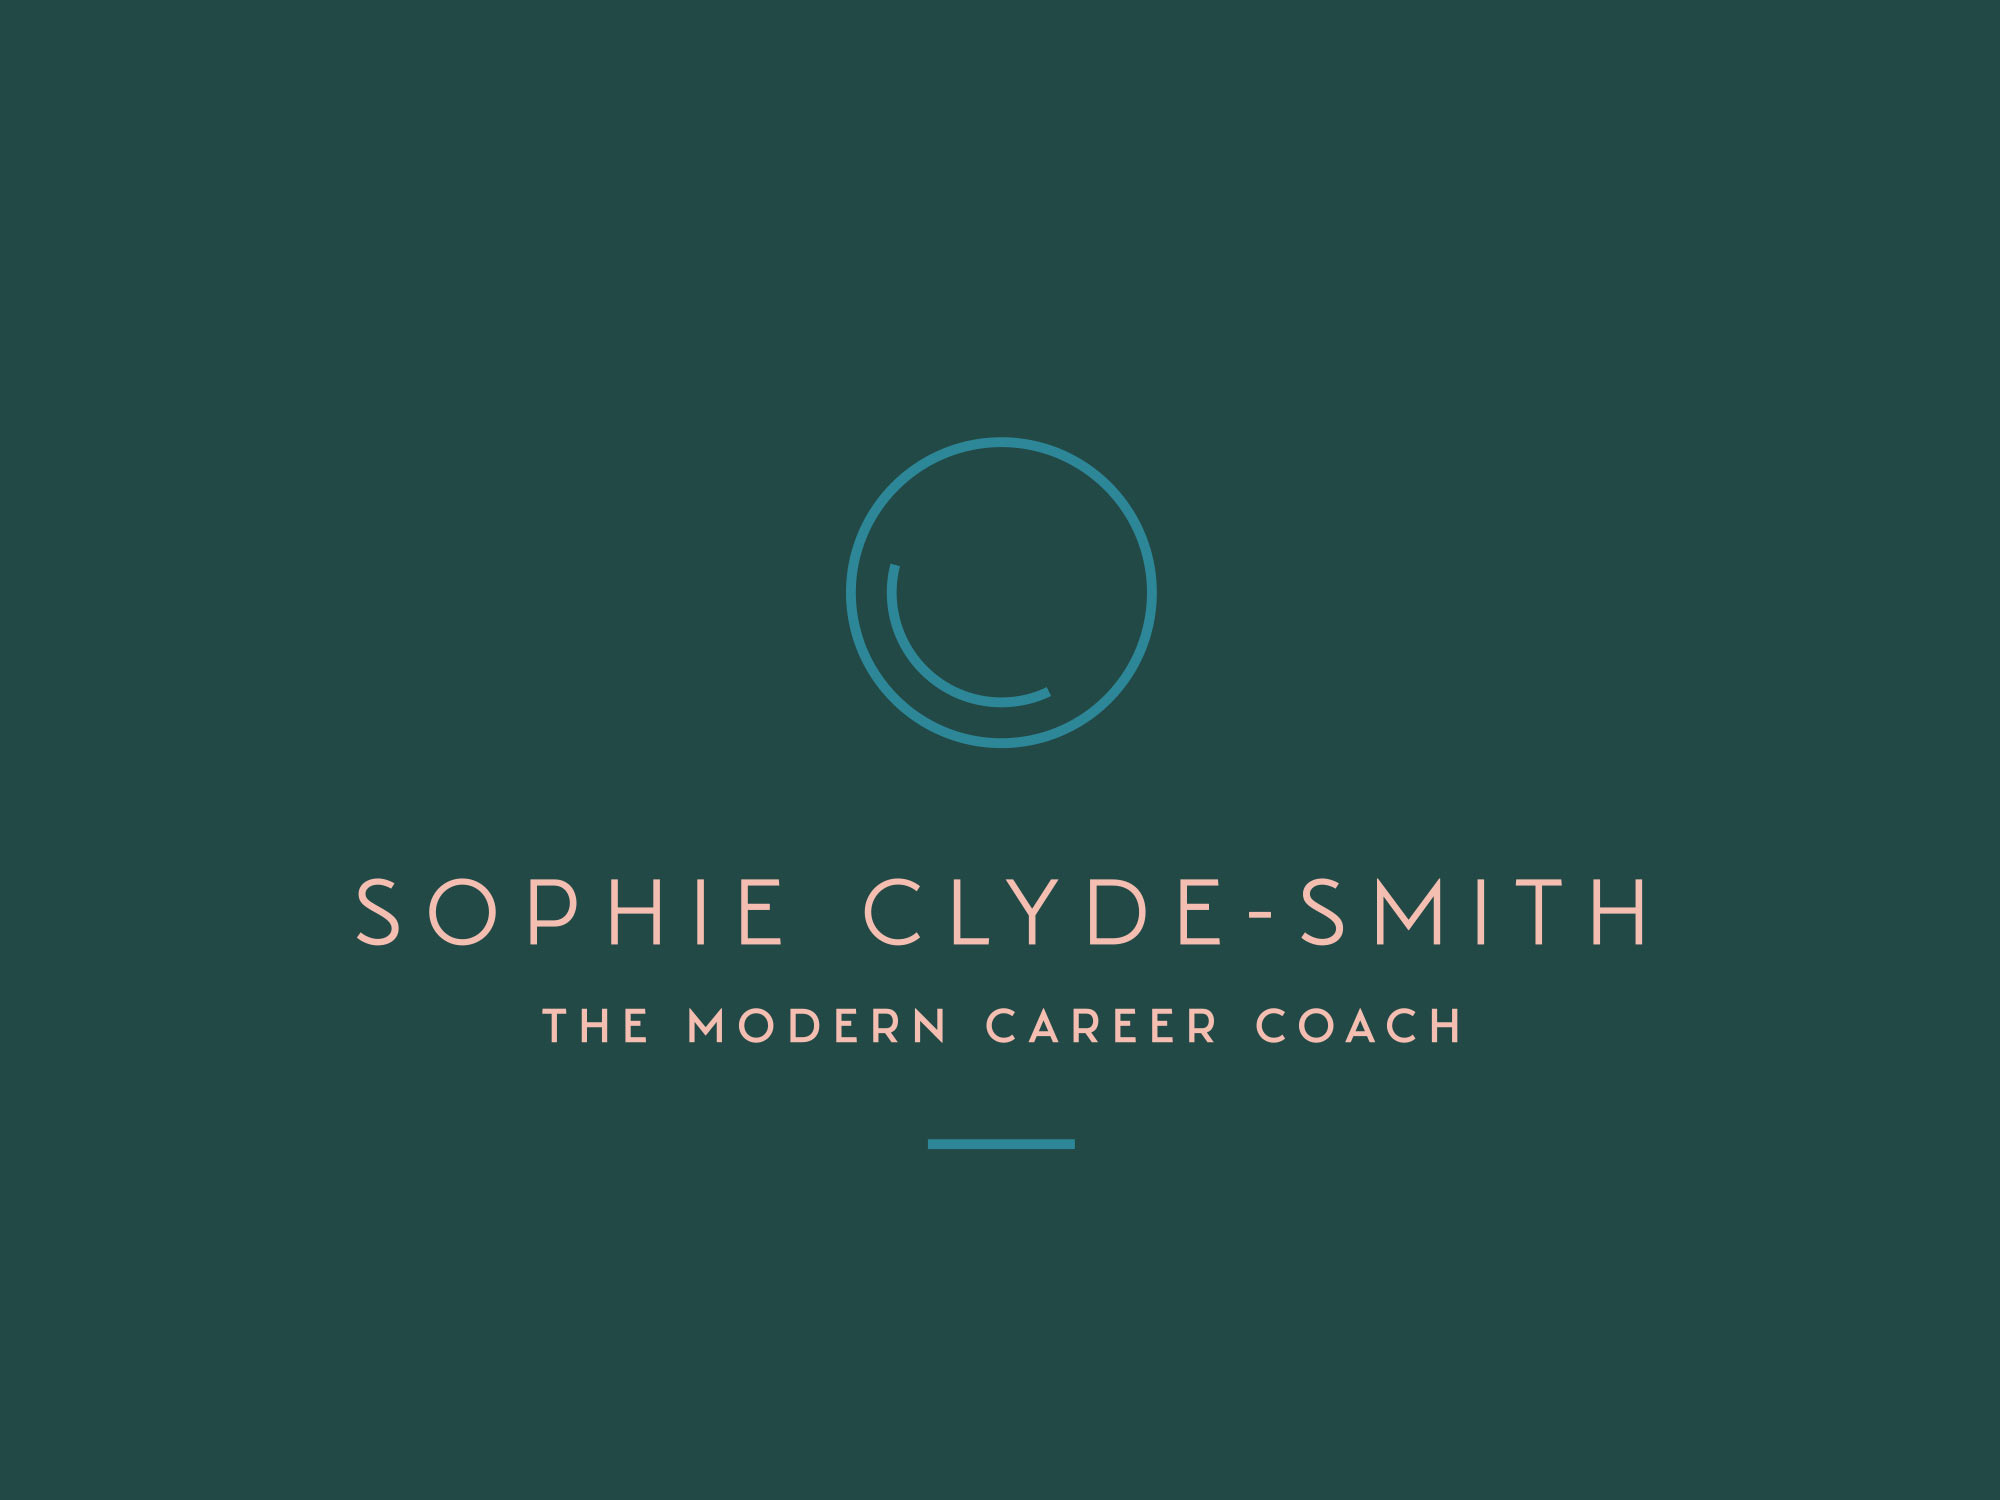 TheWildlyDesign-logo-sophie-clyde-smith.jpg